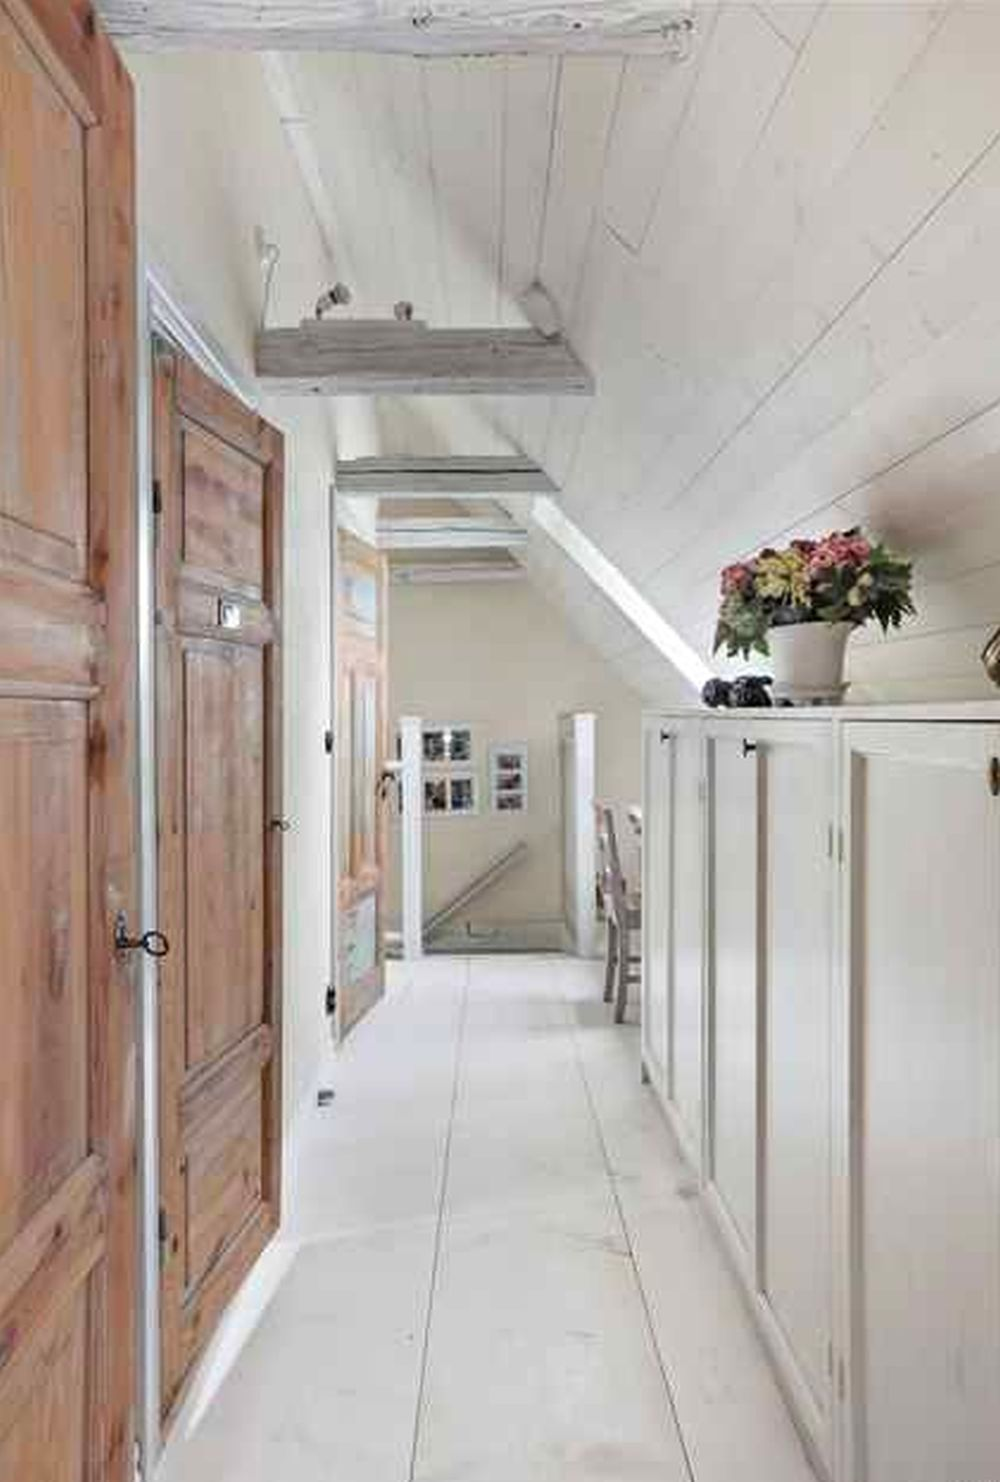 adelaparvu.com despre casa rustica Suedia, casa noua care pare veche, Foto Mats Svensson (2)